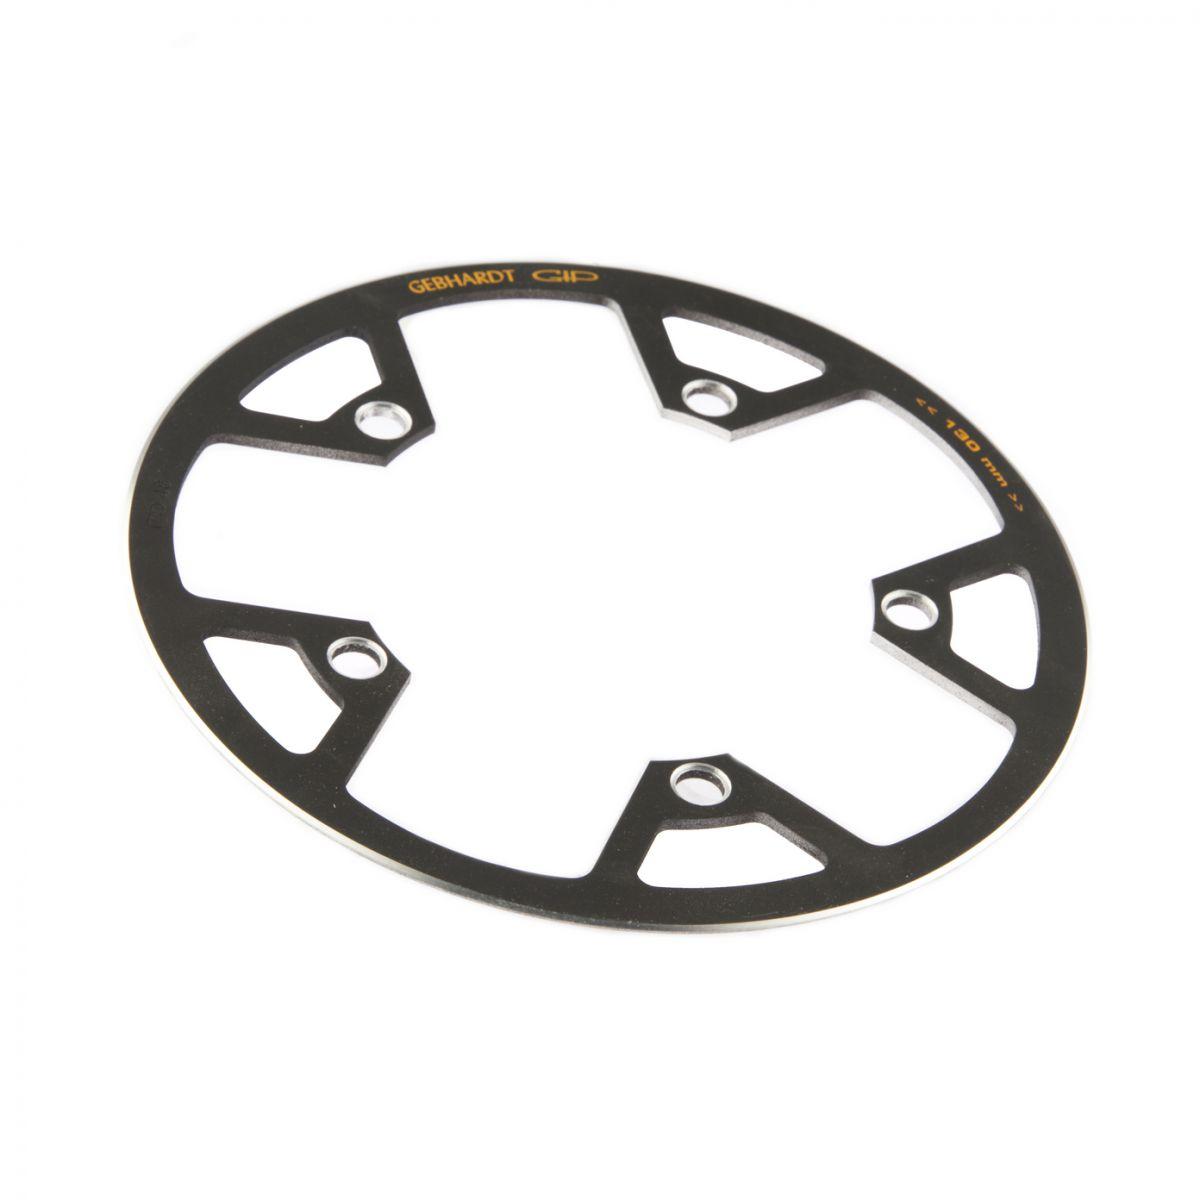 gebhardt kettingbladring rock ring classic bcd 135mm 5gats 42t zwart